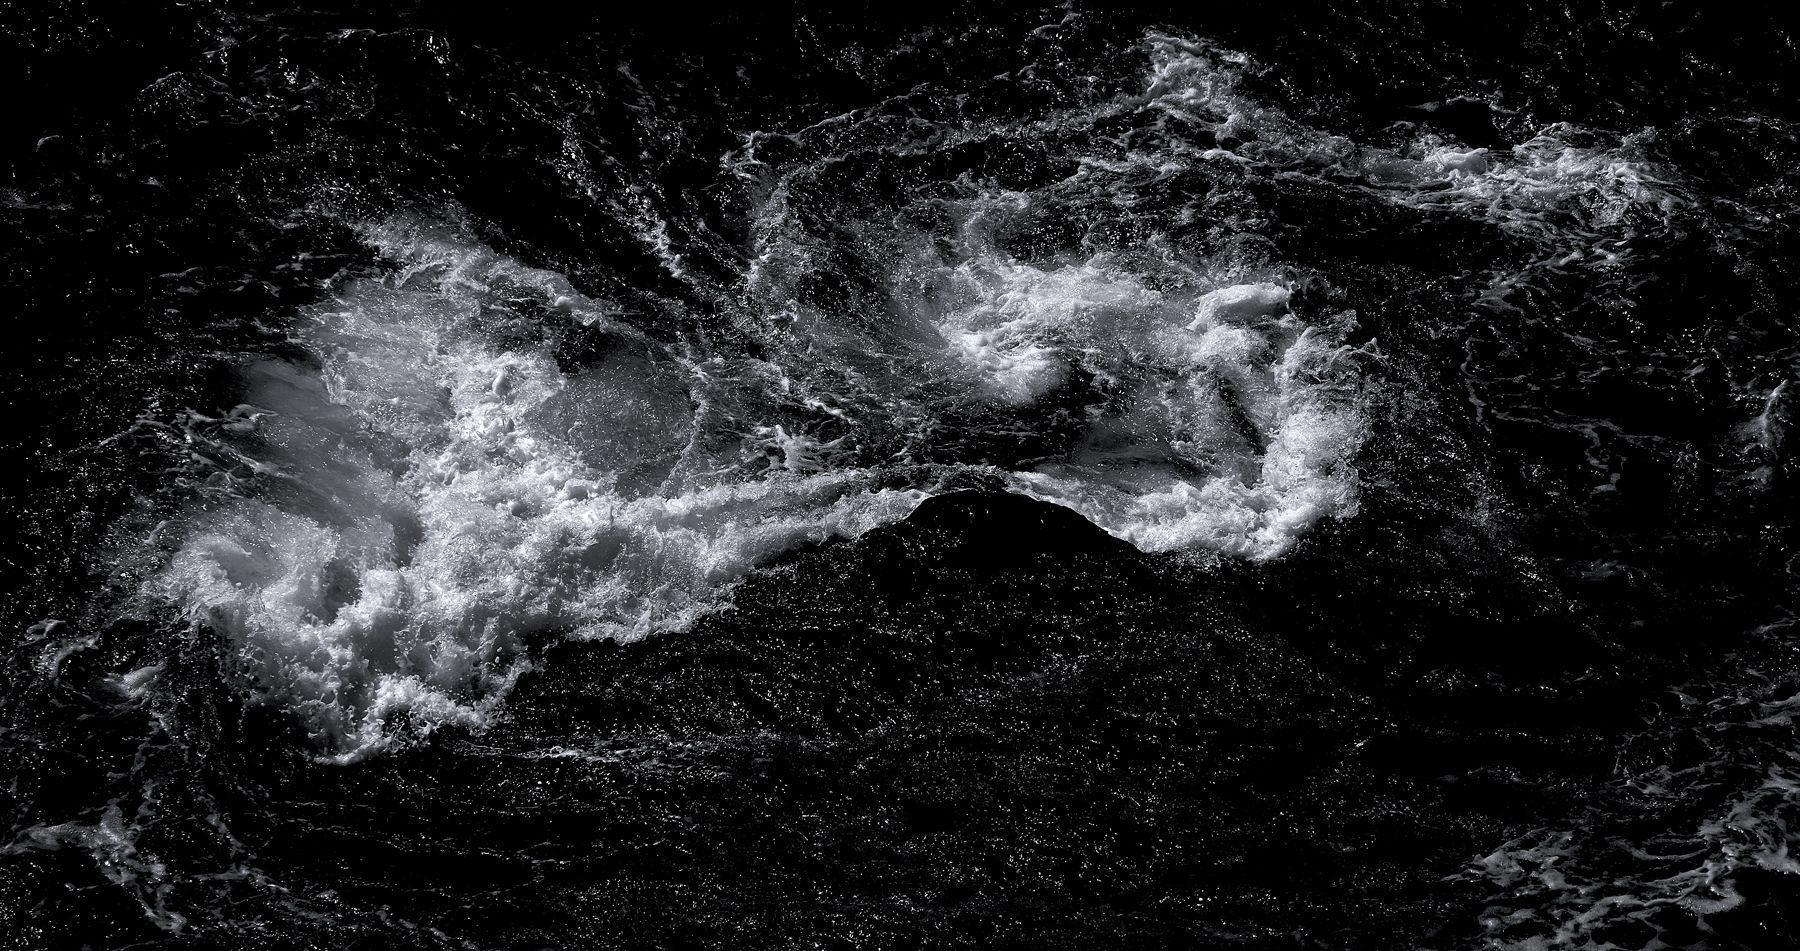 Wave Nebulae #18 ©2020 L. Aviva Diamond